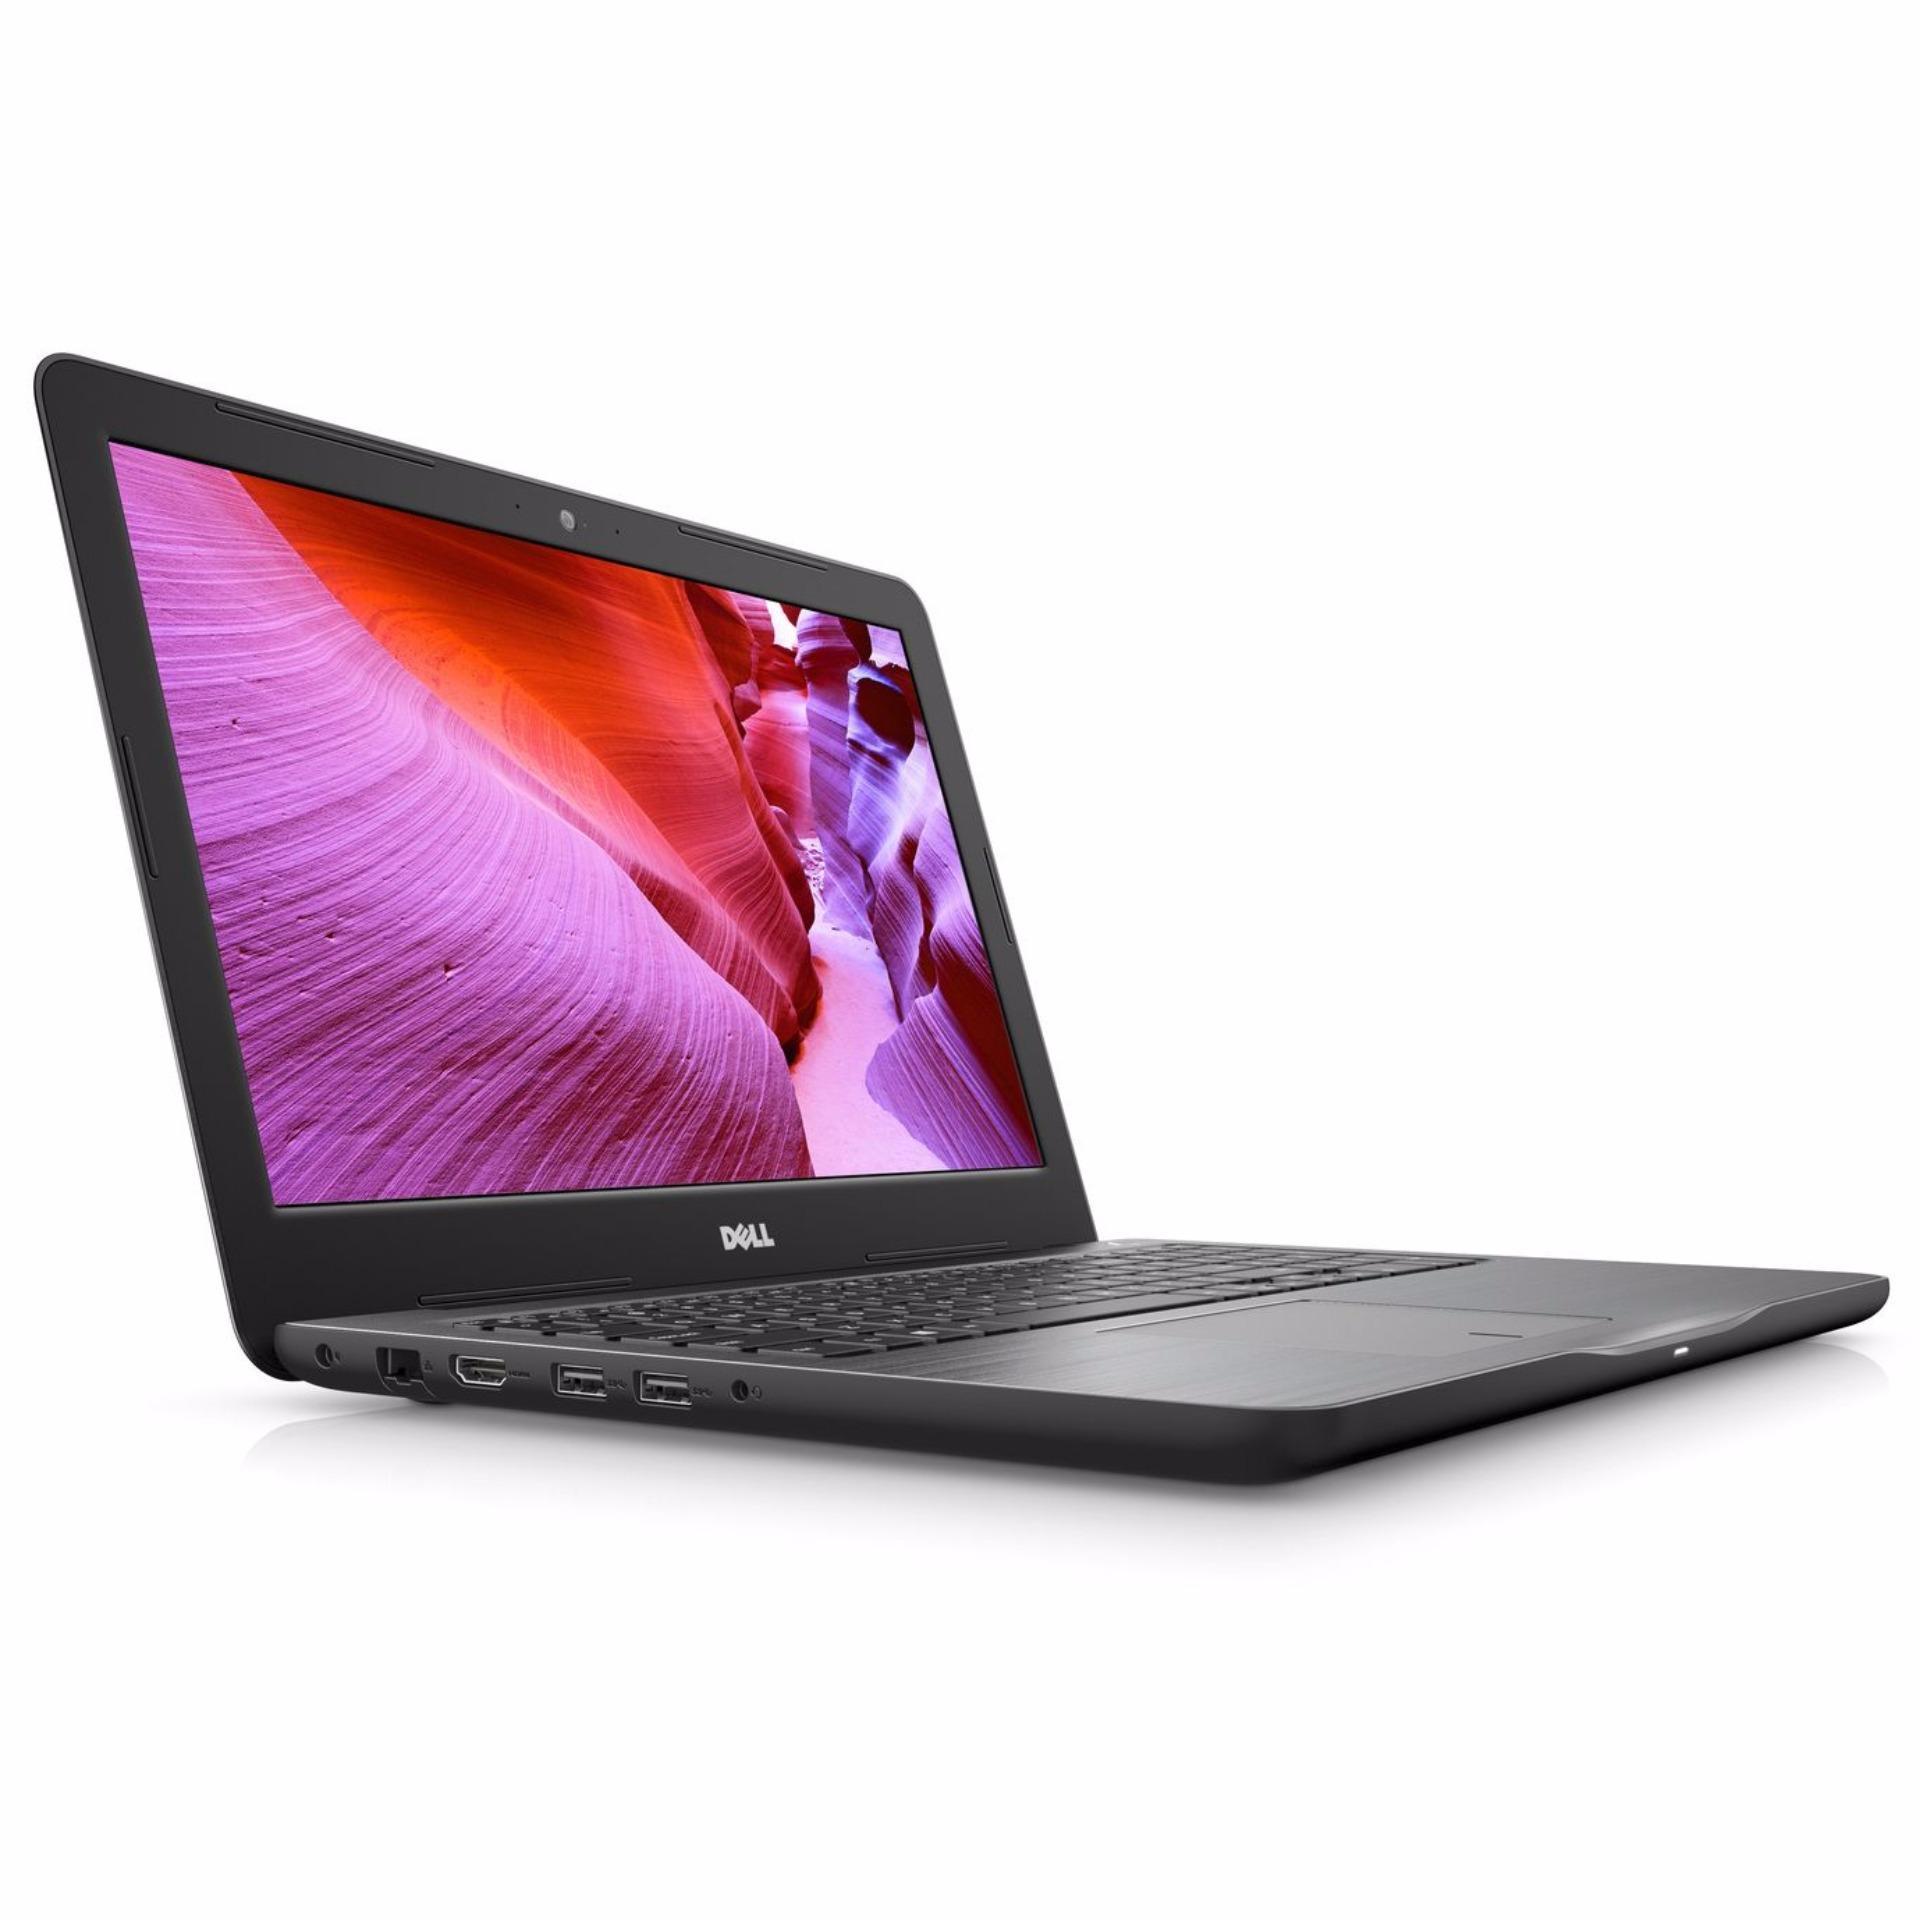 *CNY SALE Dell Inspiron Notebook 5567-750824GL (Black) (Intel i7-7500U, 8GB RAM, 256GB SSD, AMD Radeon R7 M445 4GB GDDR5 Graphics, 15.6-inch FHD)